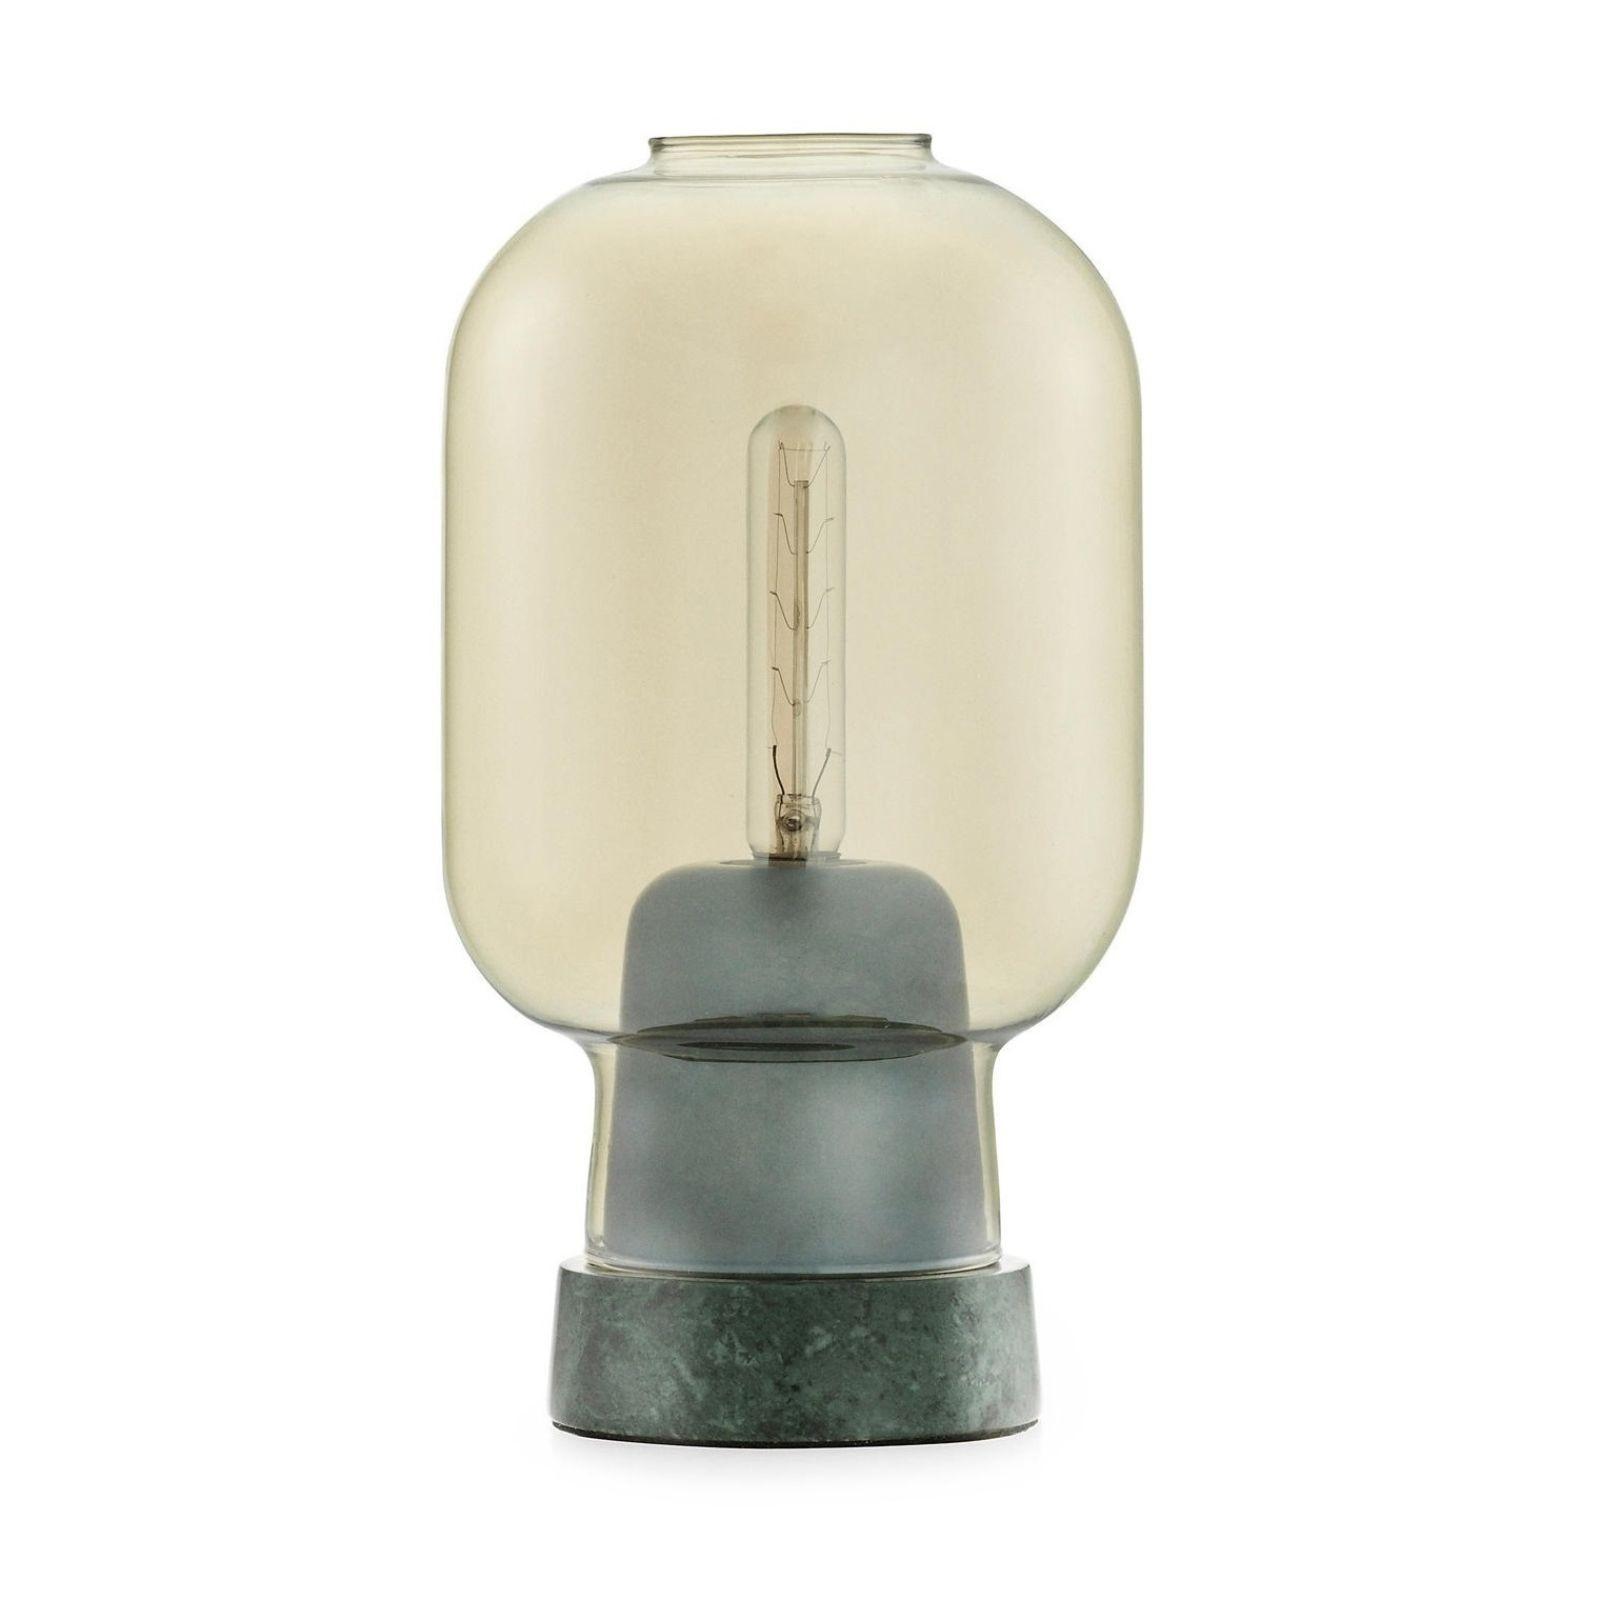 Amp Table Lamp (Gold / Green) - Normann Copenhagen